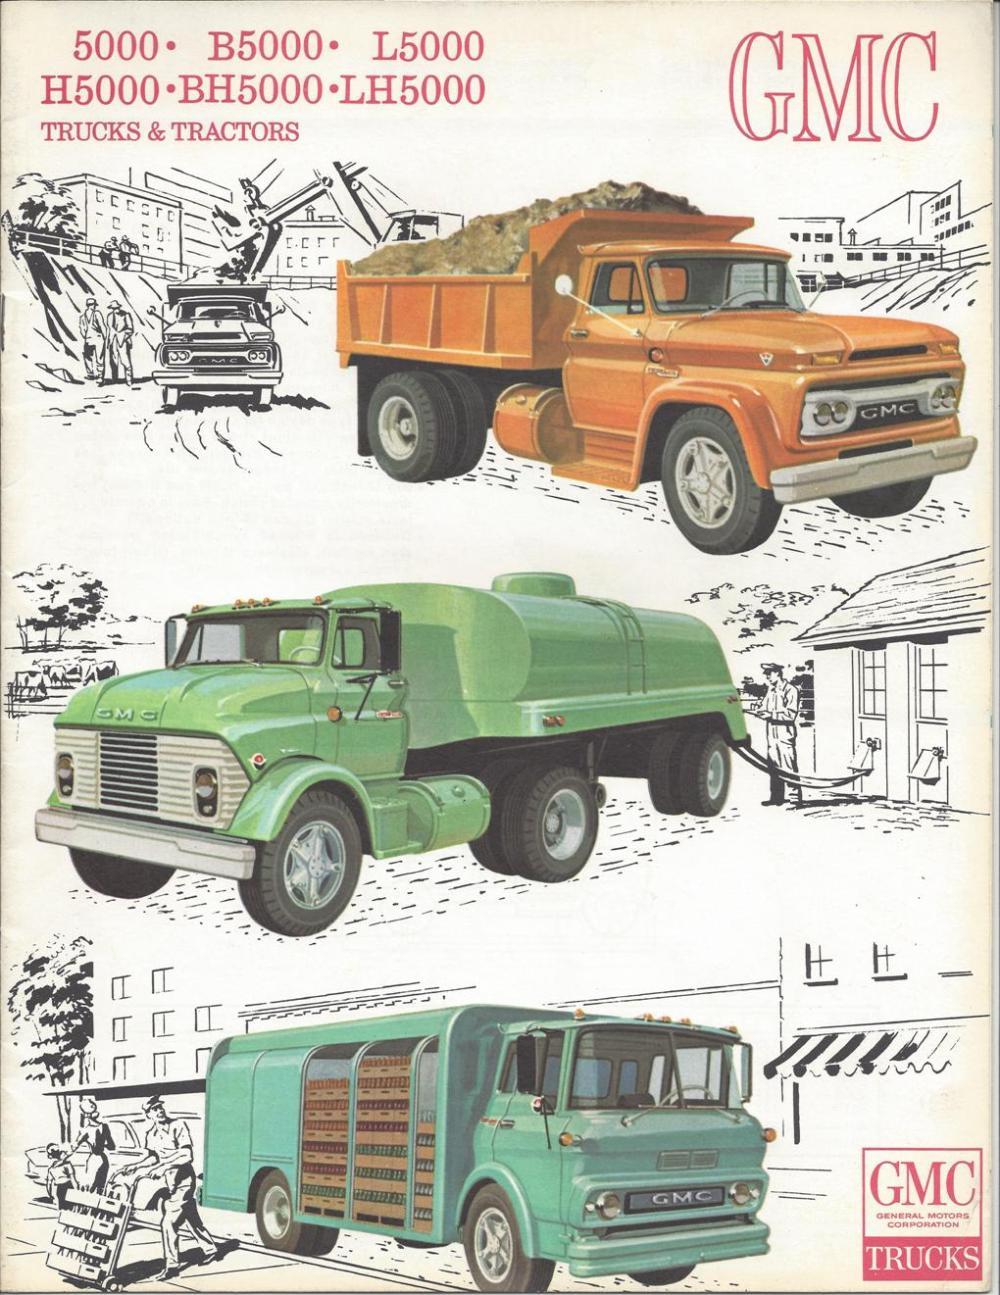 medium resolution of  92 1965 gmc 5000 6x6 truck 5 500